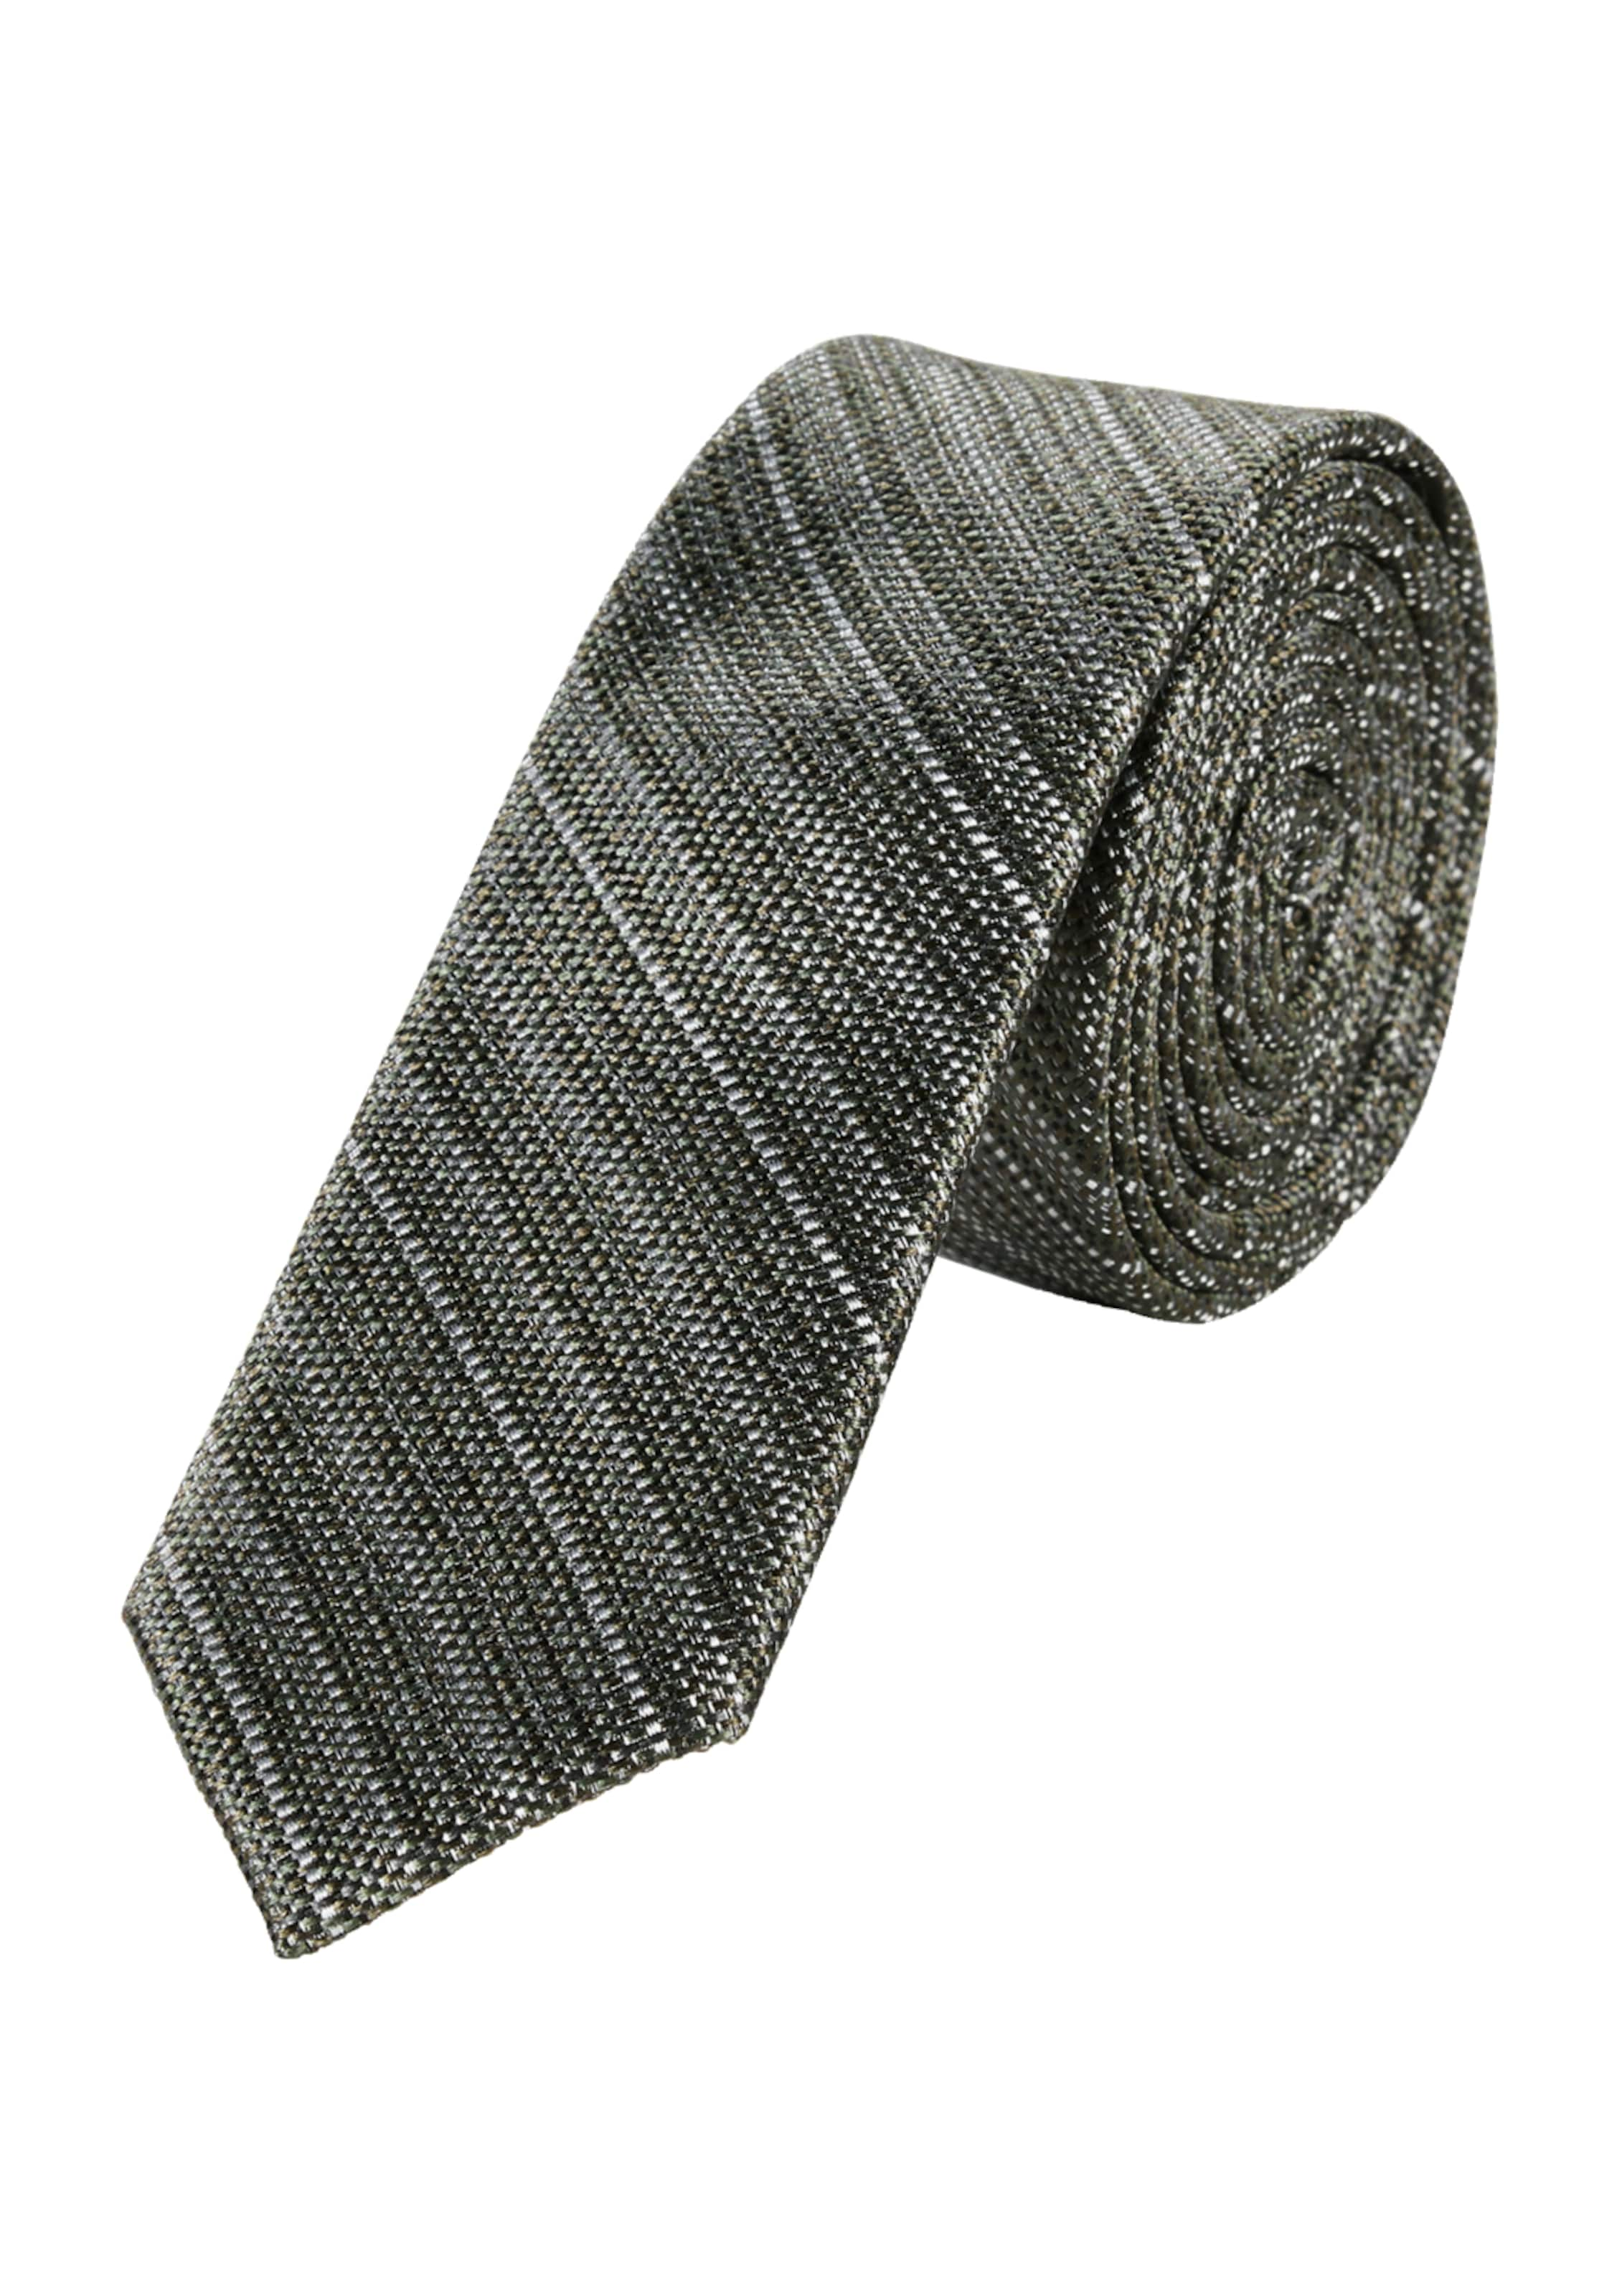 In oliver Black S GrünKhaki Label Krawatte pSMVqUz